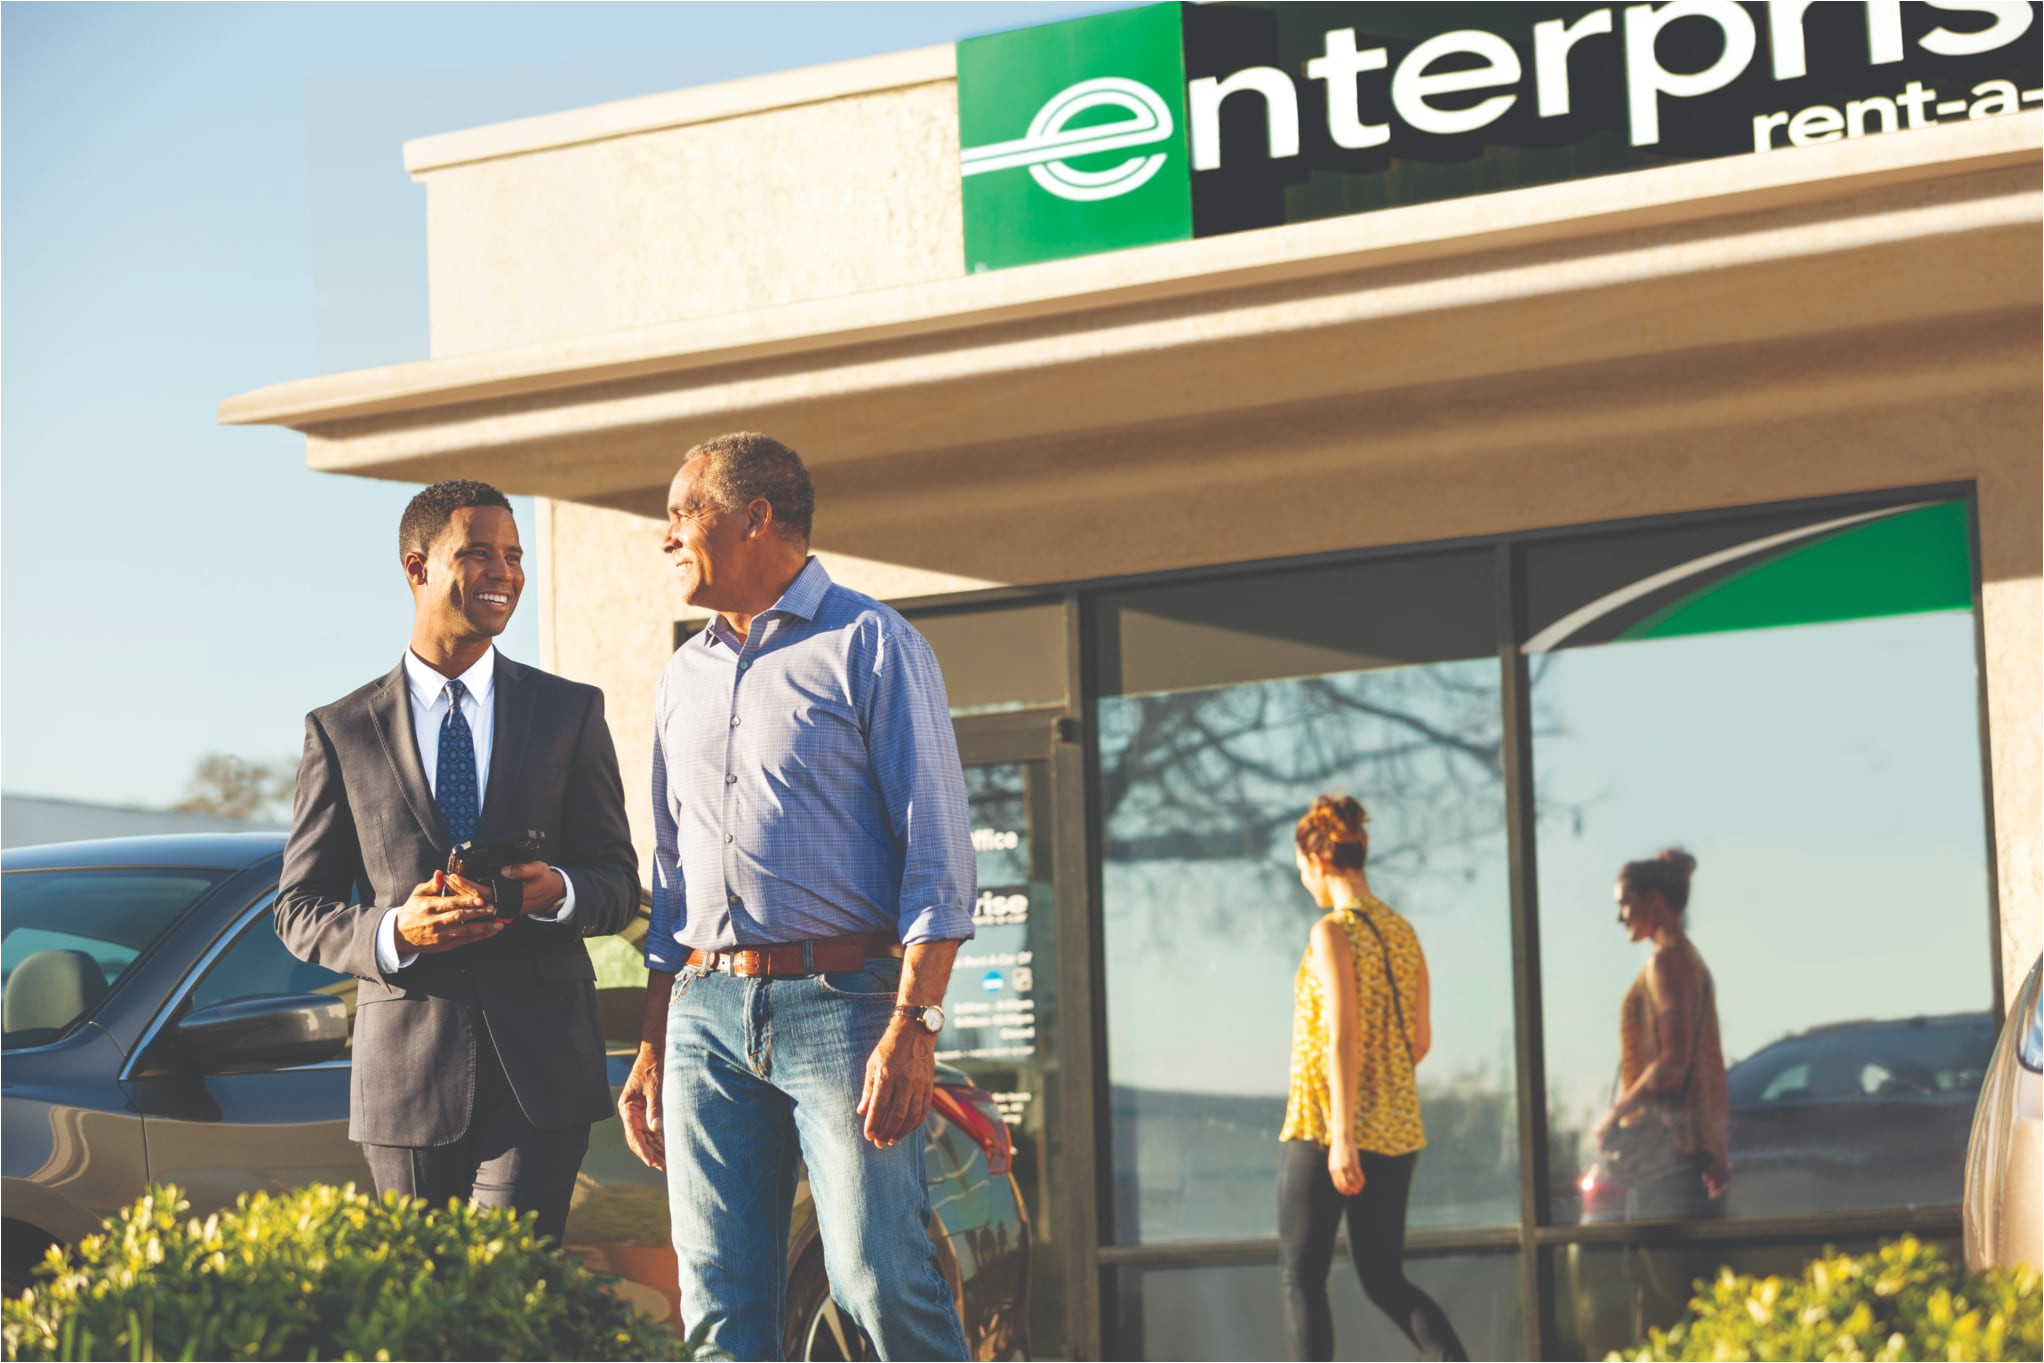 car rental st louis lambert international airport stl enterprise rent a car